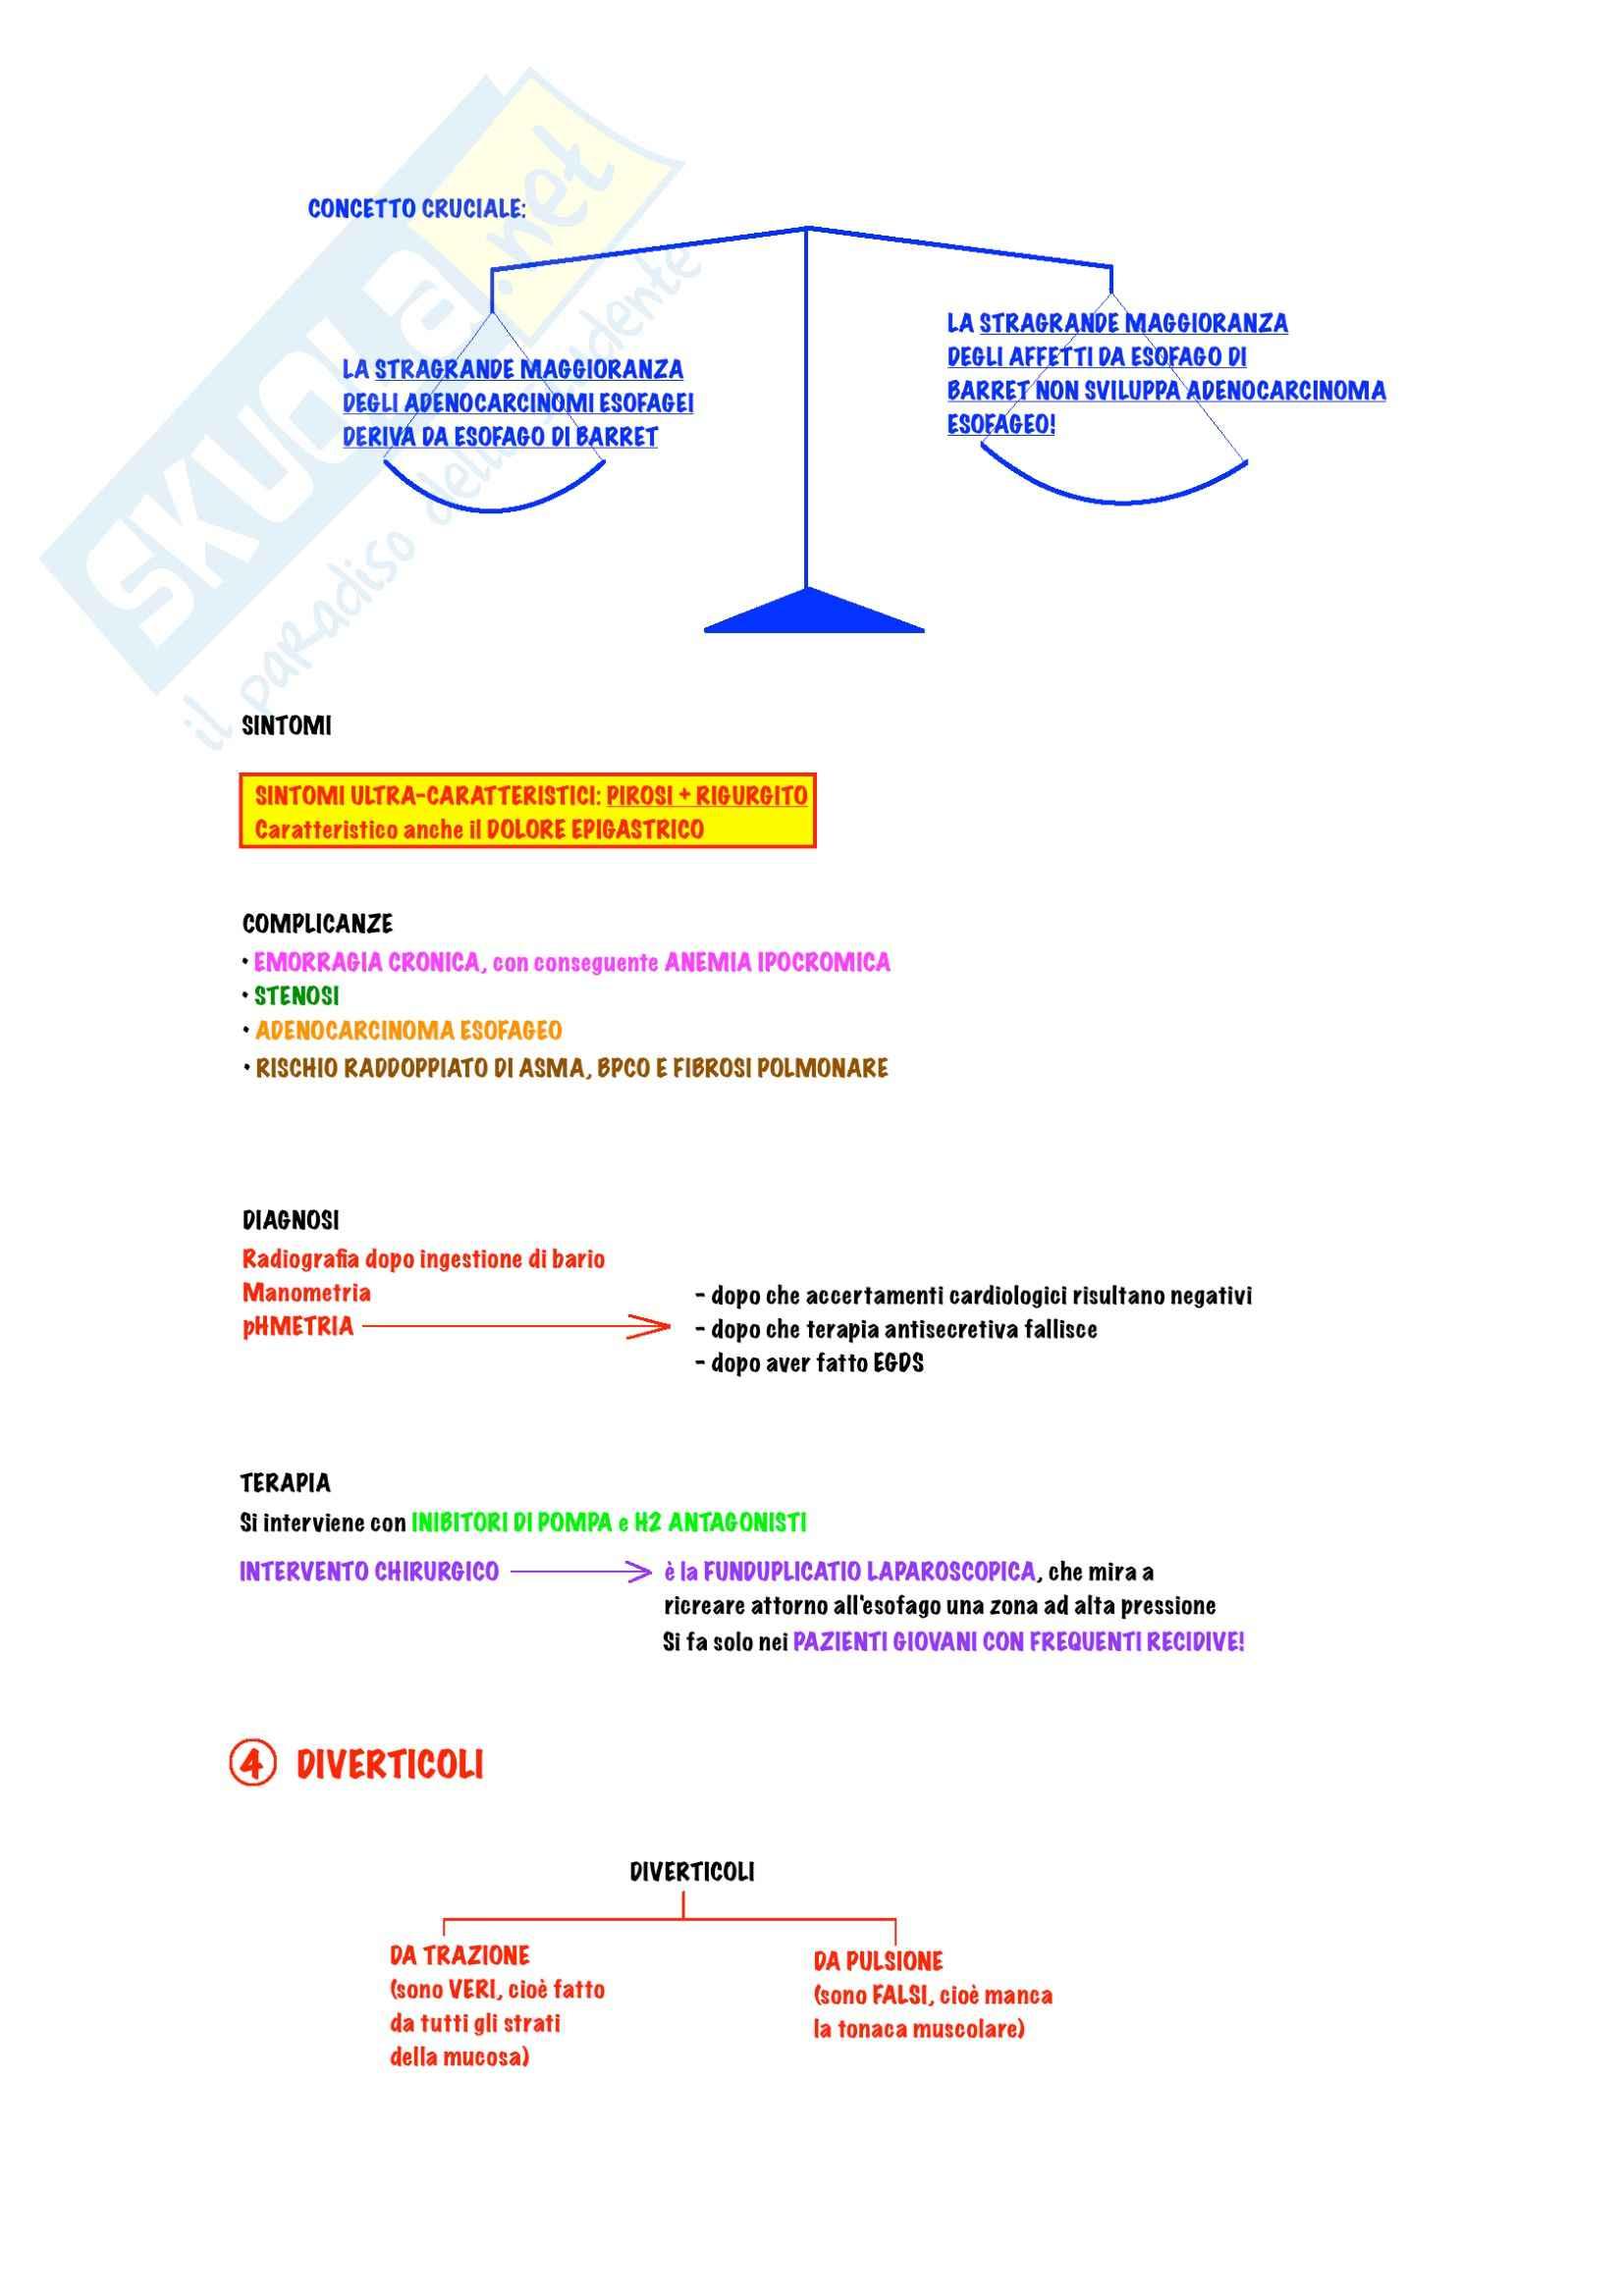 Gastroenterologia - Malattie dell'esofago Pag. 6